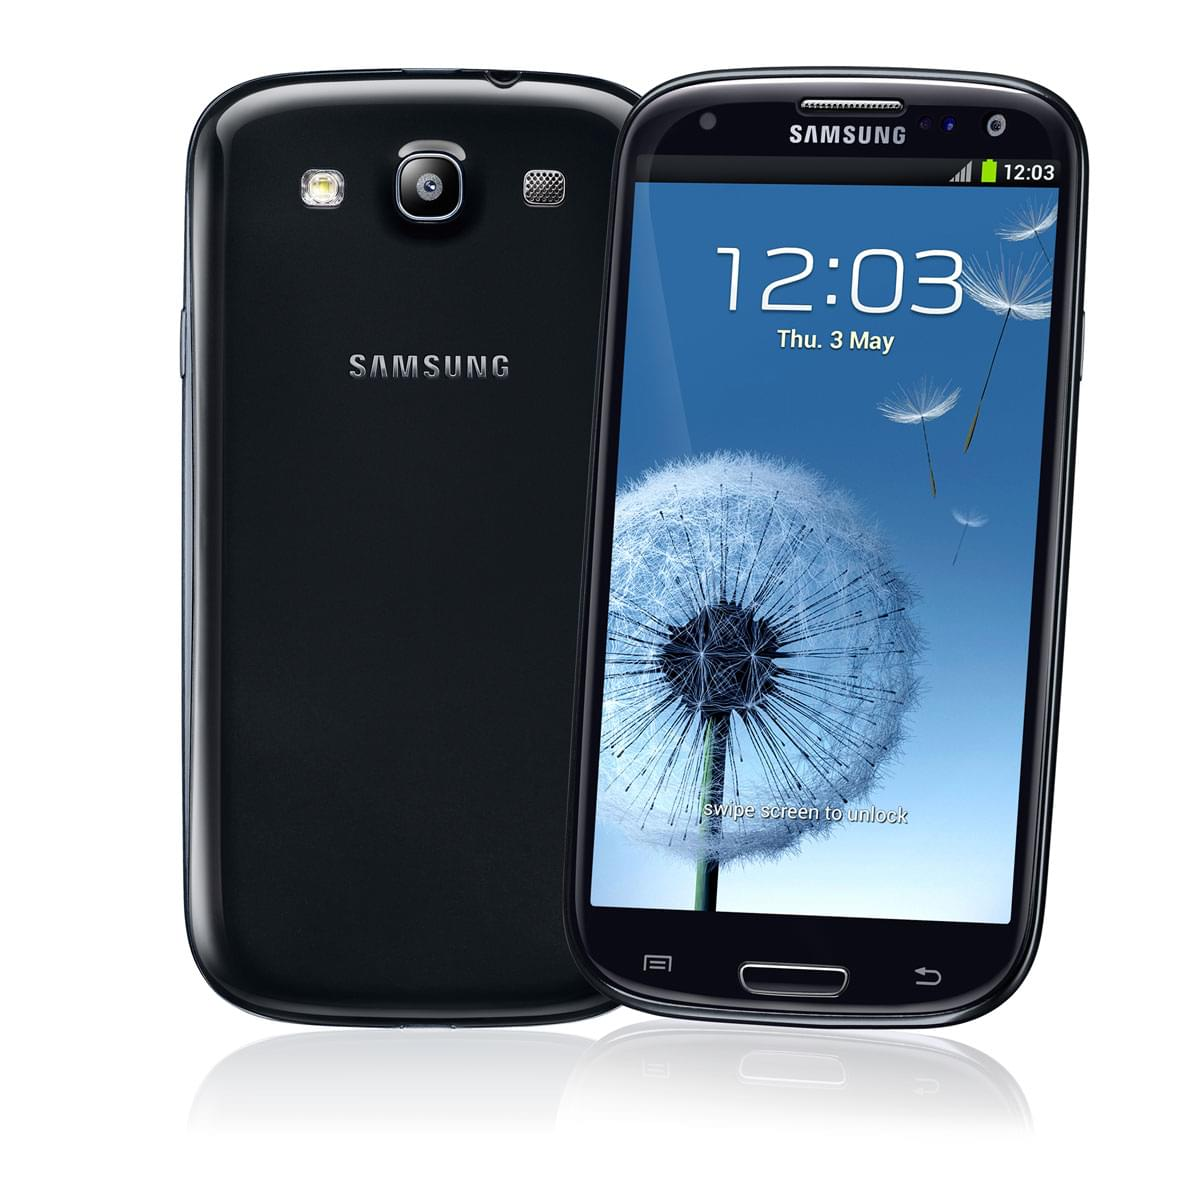 Samsung Galaxy S3 16Go Noir GT-I9300 Sapphire Black (GT-I9300BLACK) - Achat / Vente Téléphonie sur Cybertek.fr - 0